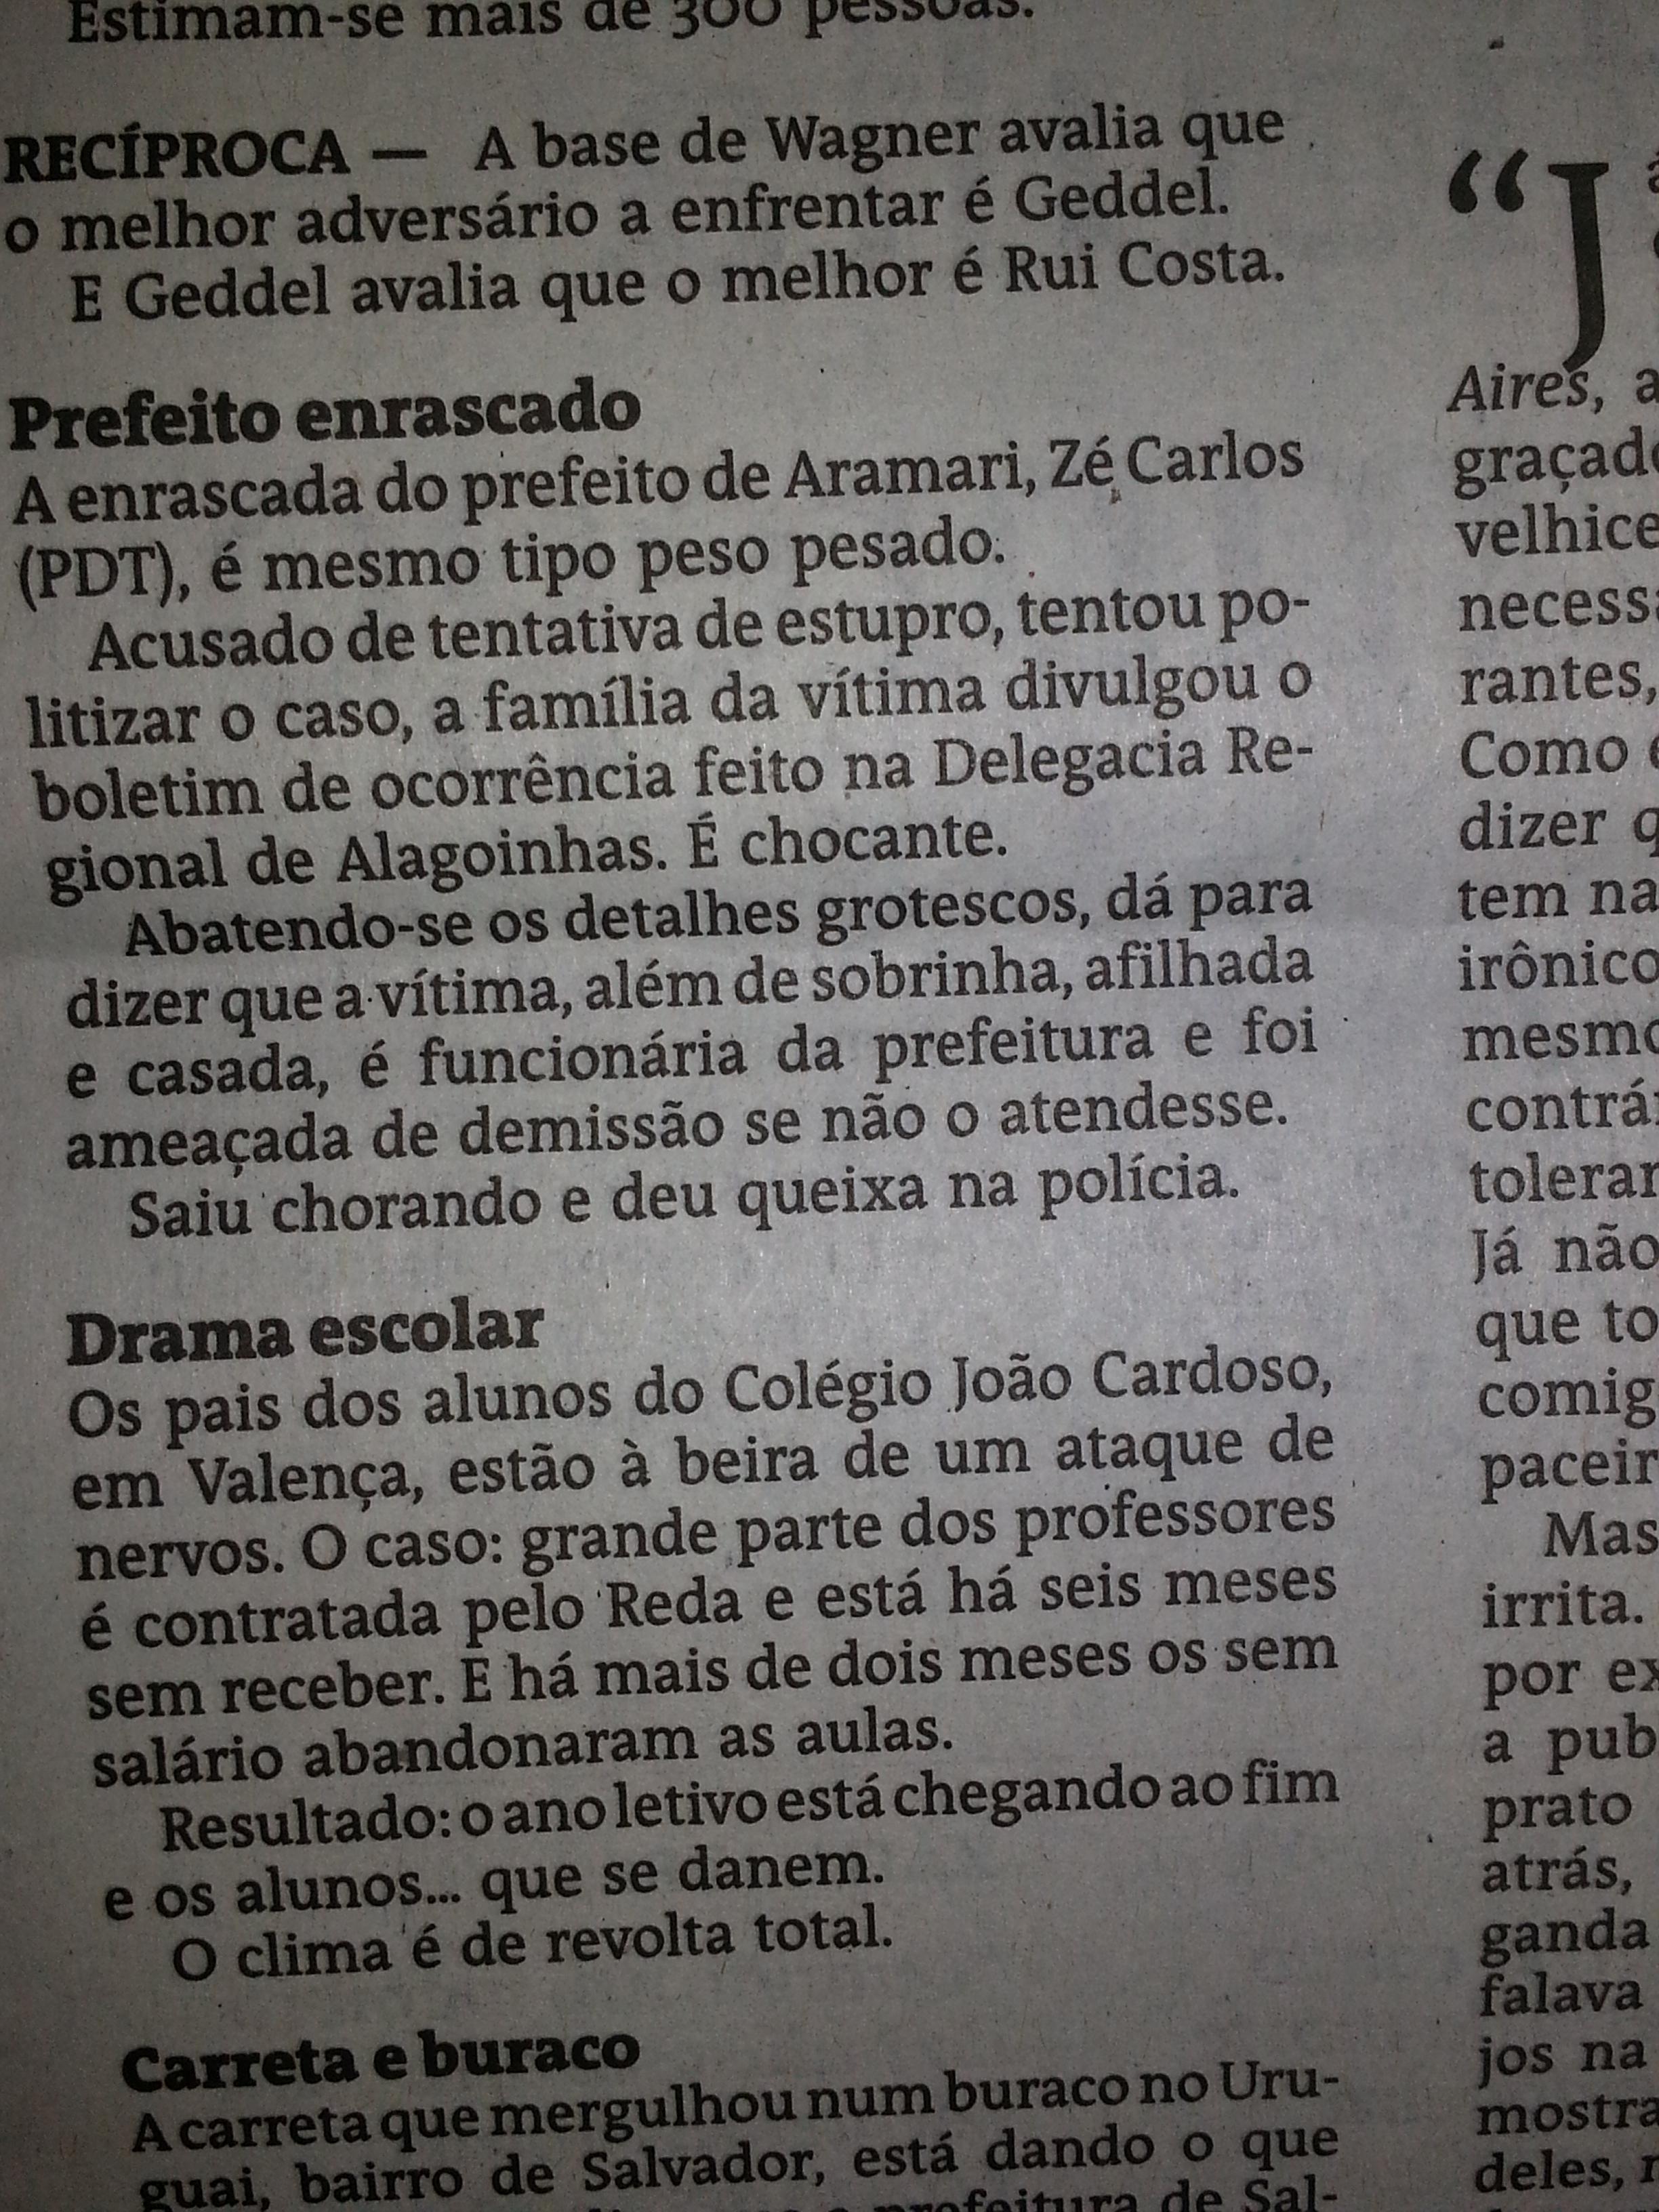 COLUNA TEMPO PRESENTE 12 DE OUTUBRO DE 2013